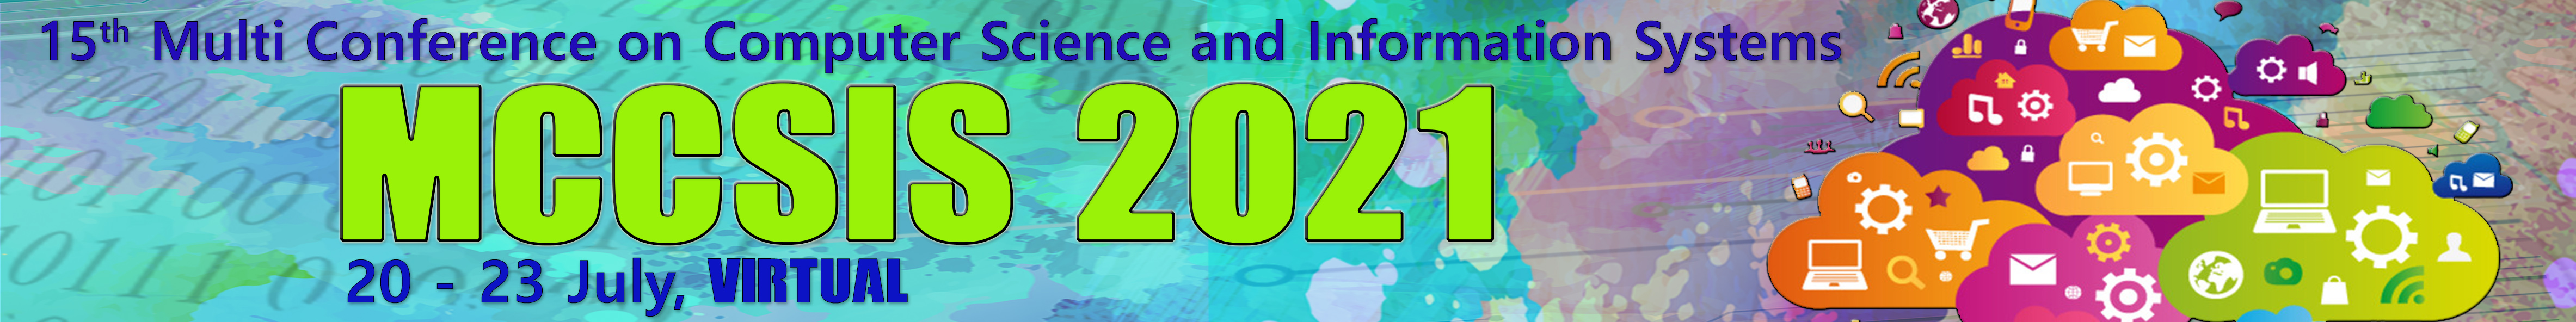 CSC 2021